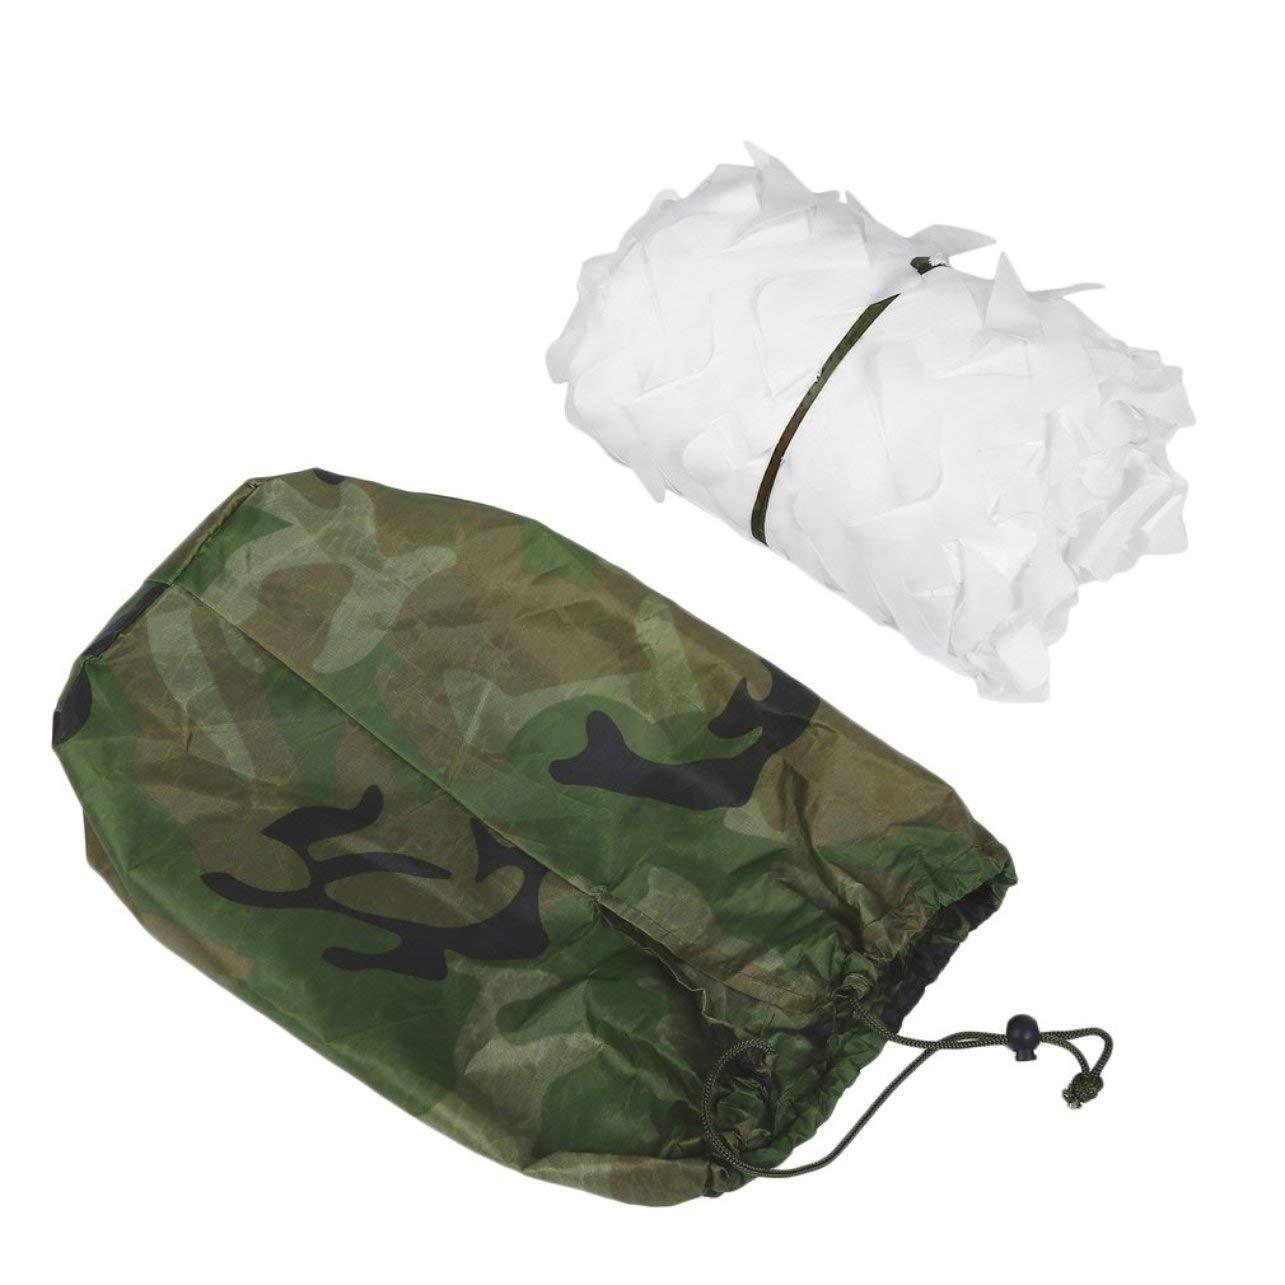 WOSOSYEYO Tarnnetz Army Military Tarnnetz Autoabdeckzelt Jagdjalousien Netting Optional Gr/ö/ße Lange Abdeckung Verbergen Drop Net